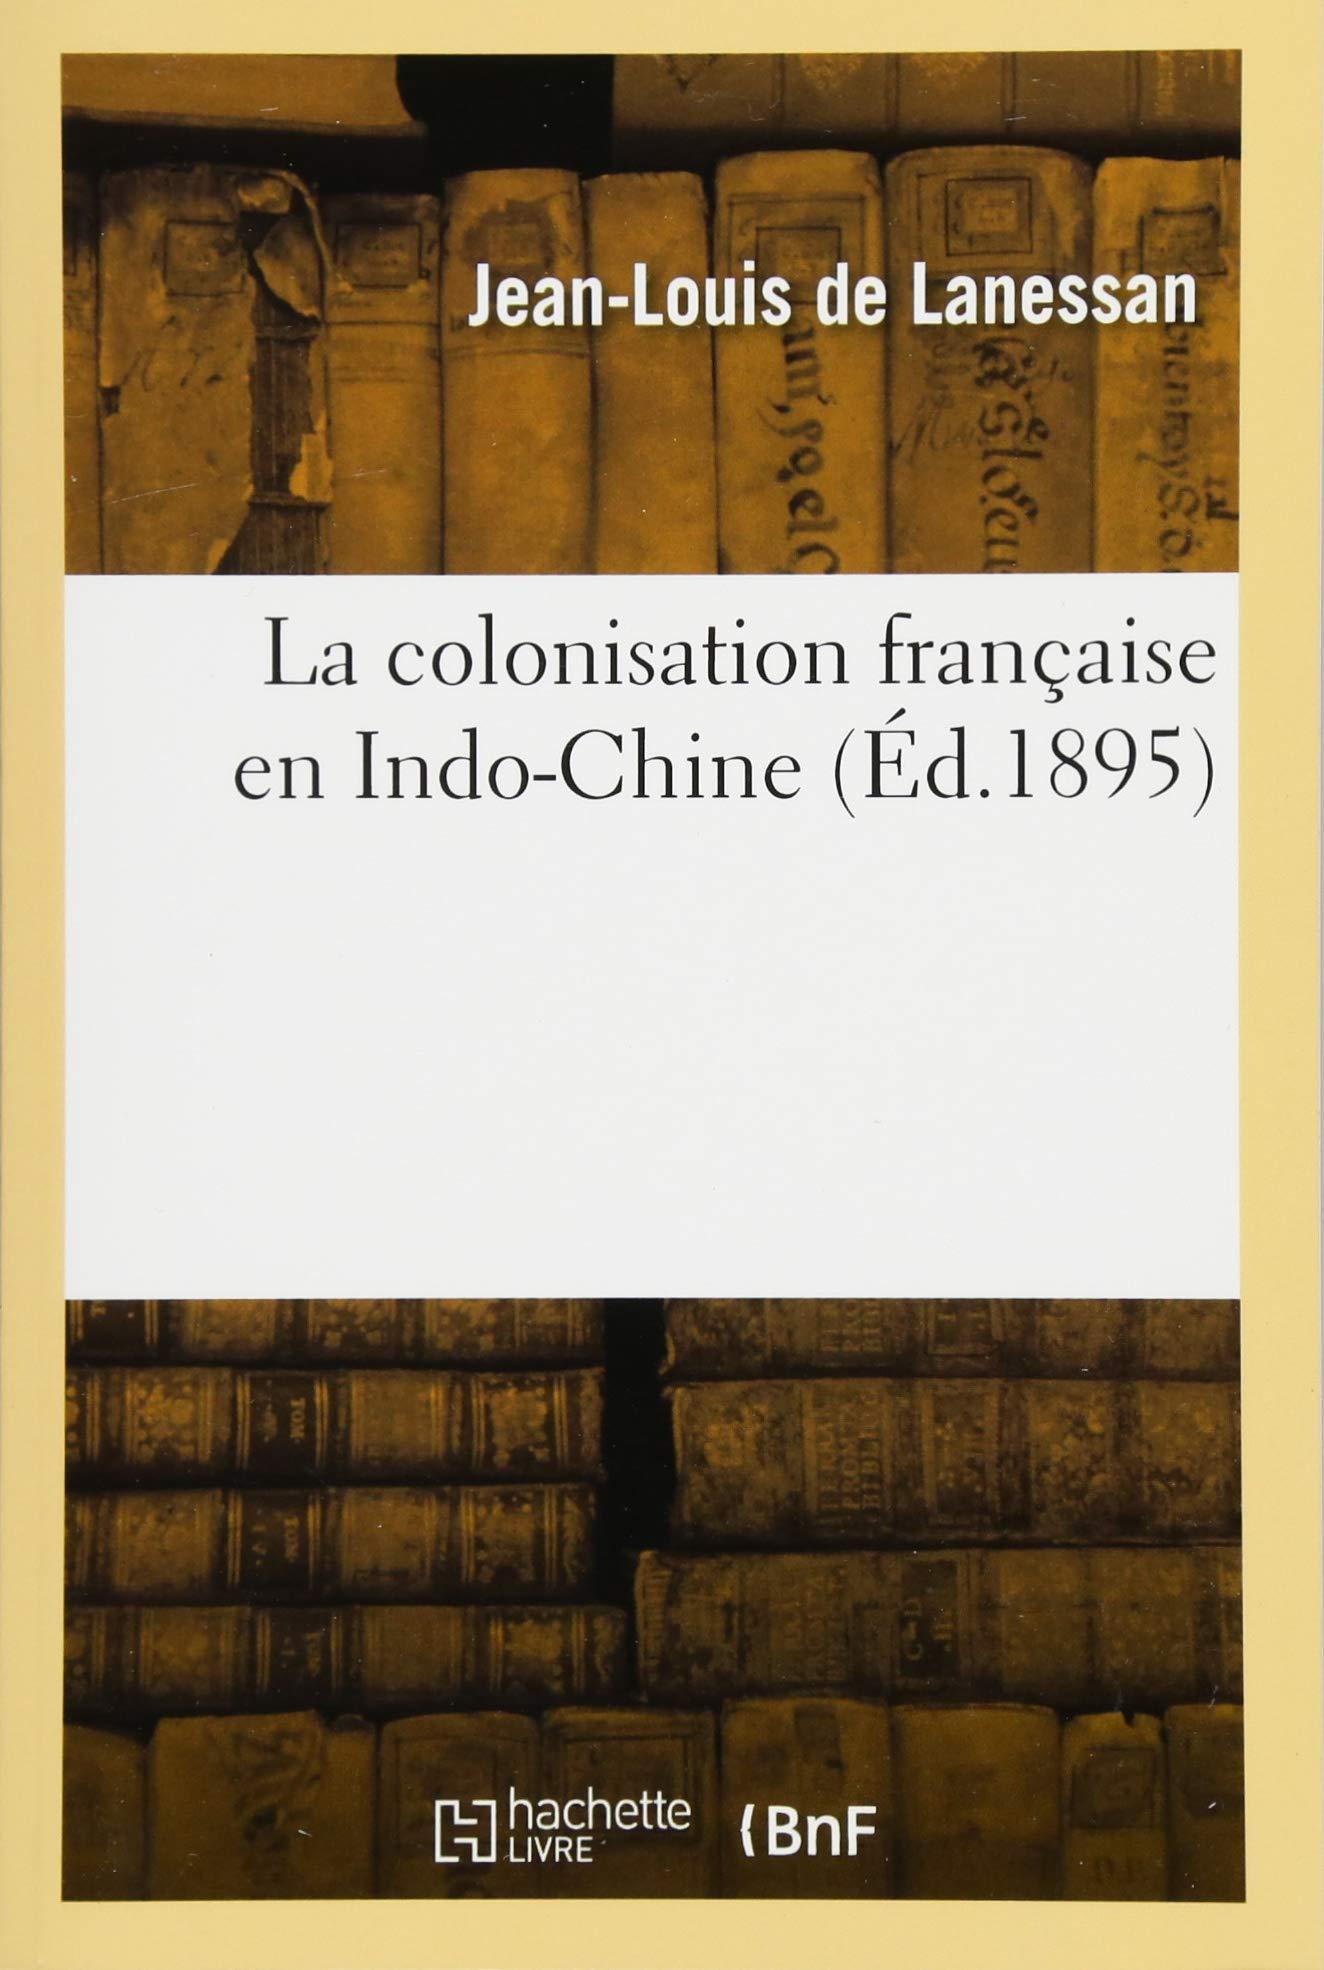 Download La Colonisation Francaise En Indo-Chine (Histoire) (French Edition) PDF